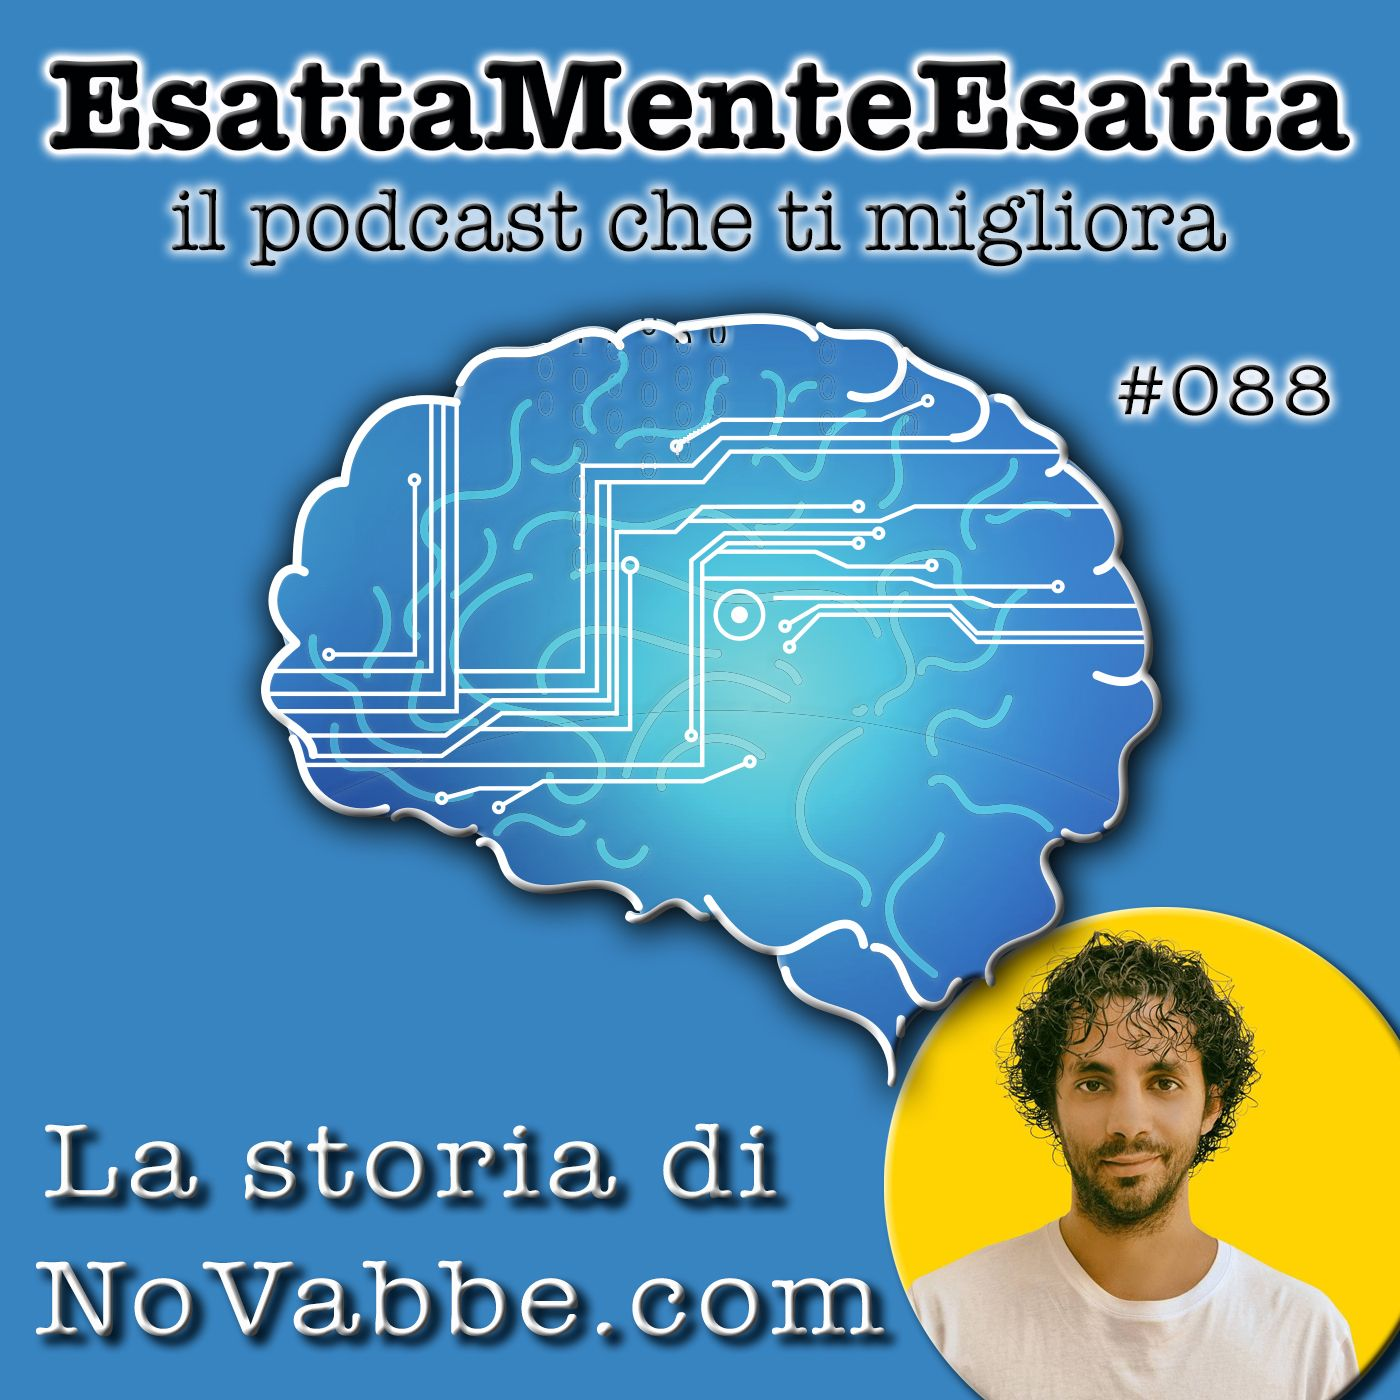 Intervista: Pierpaolo Corso di NoVabbè.com si racconta ! #088